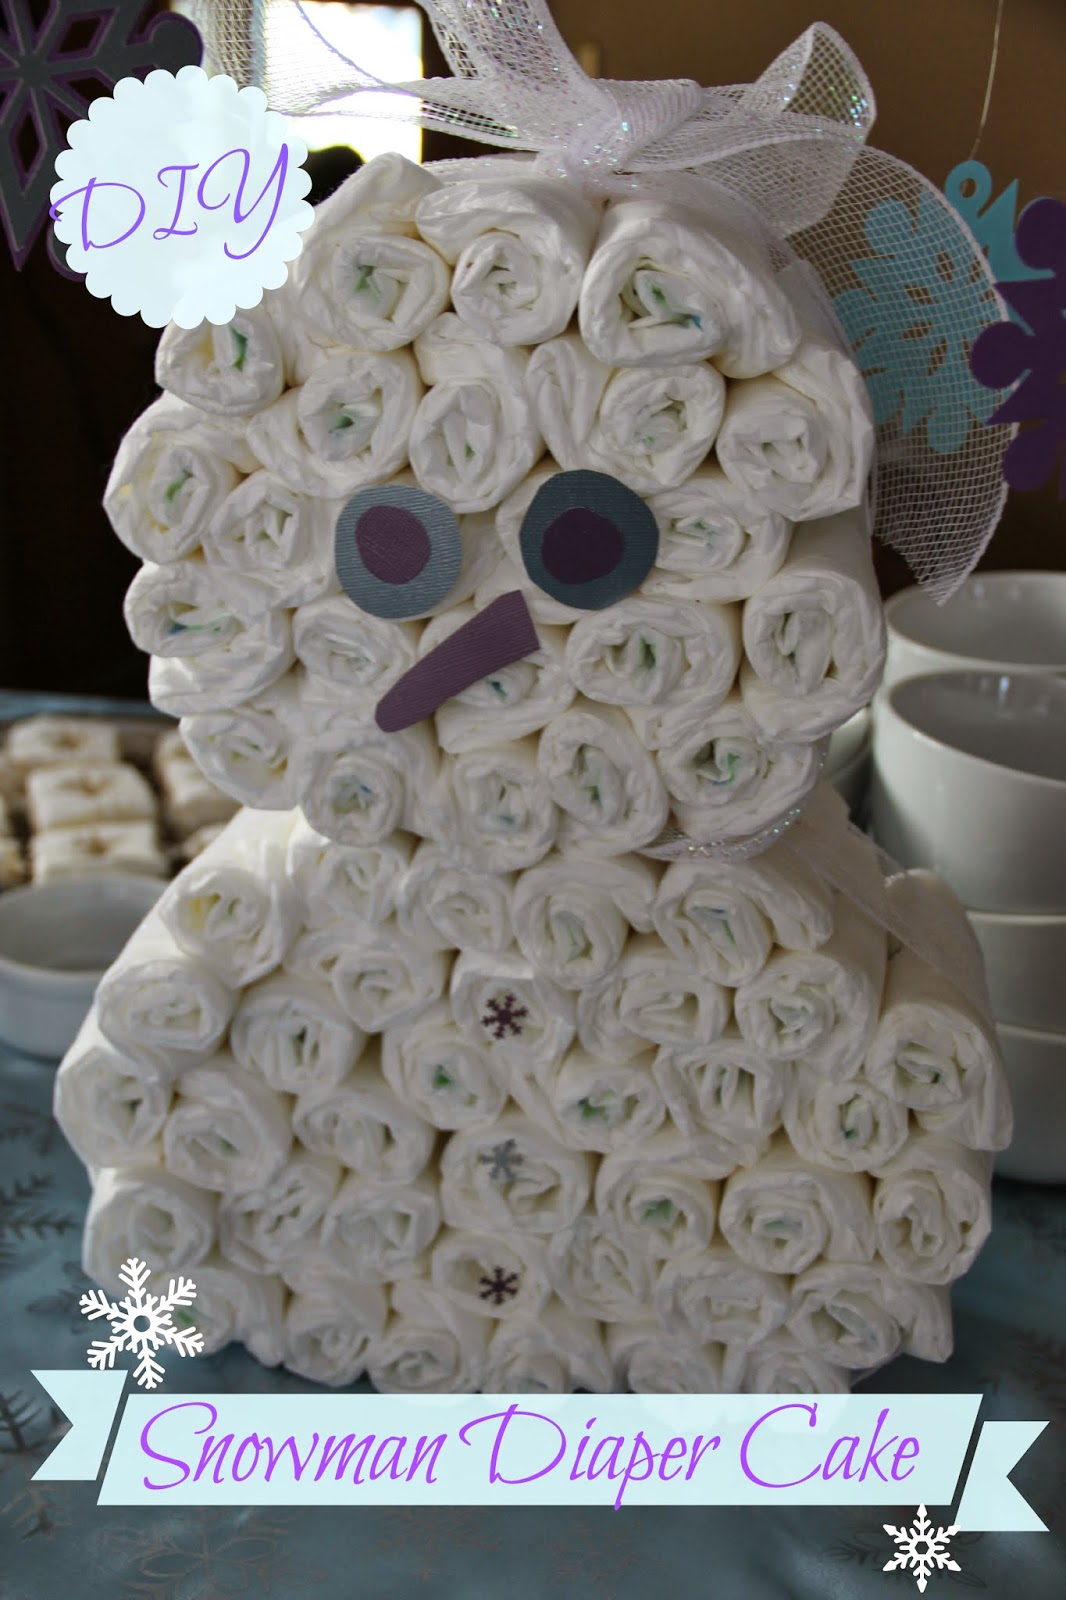 Snowman Diaper Cake Instructions